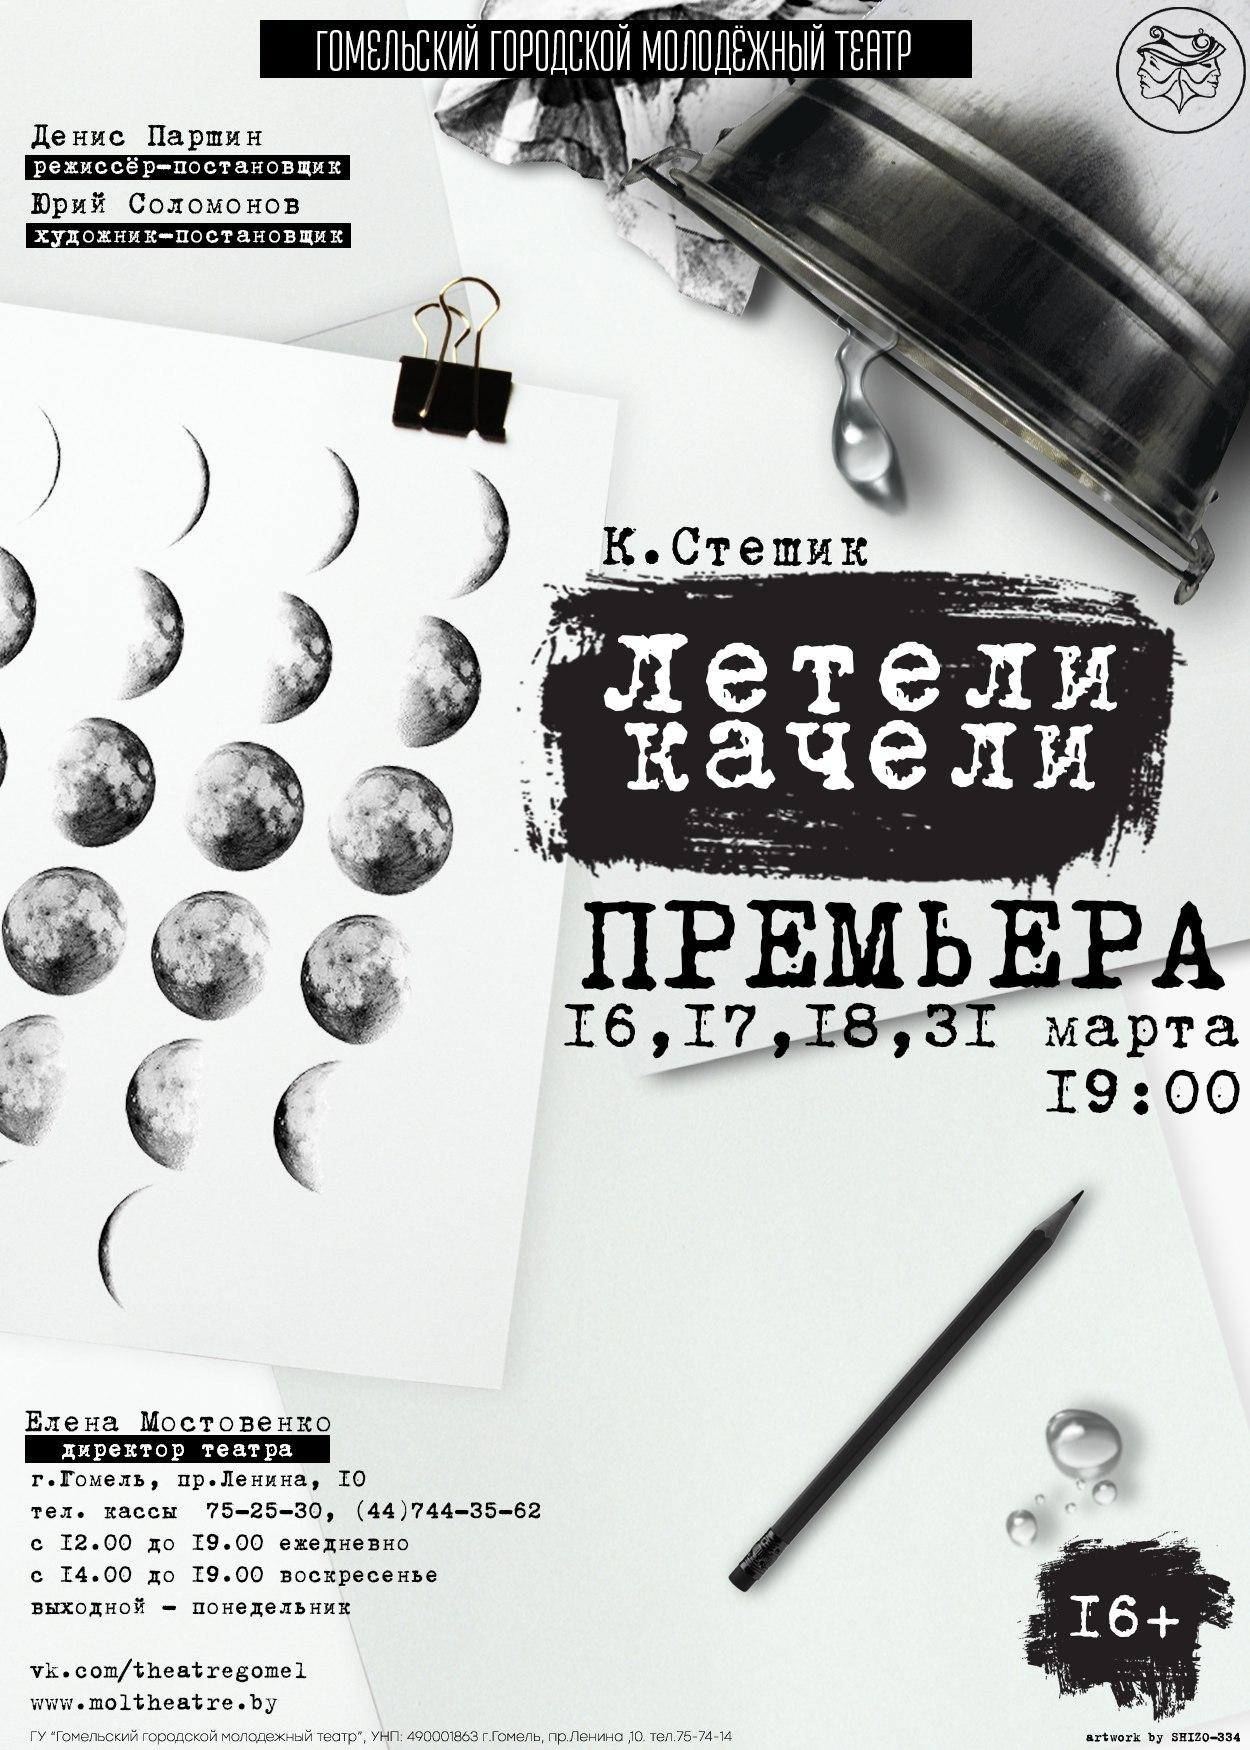 EYKkfI6eHgA (1)